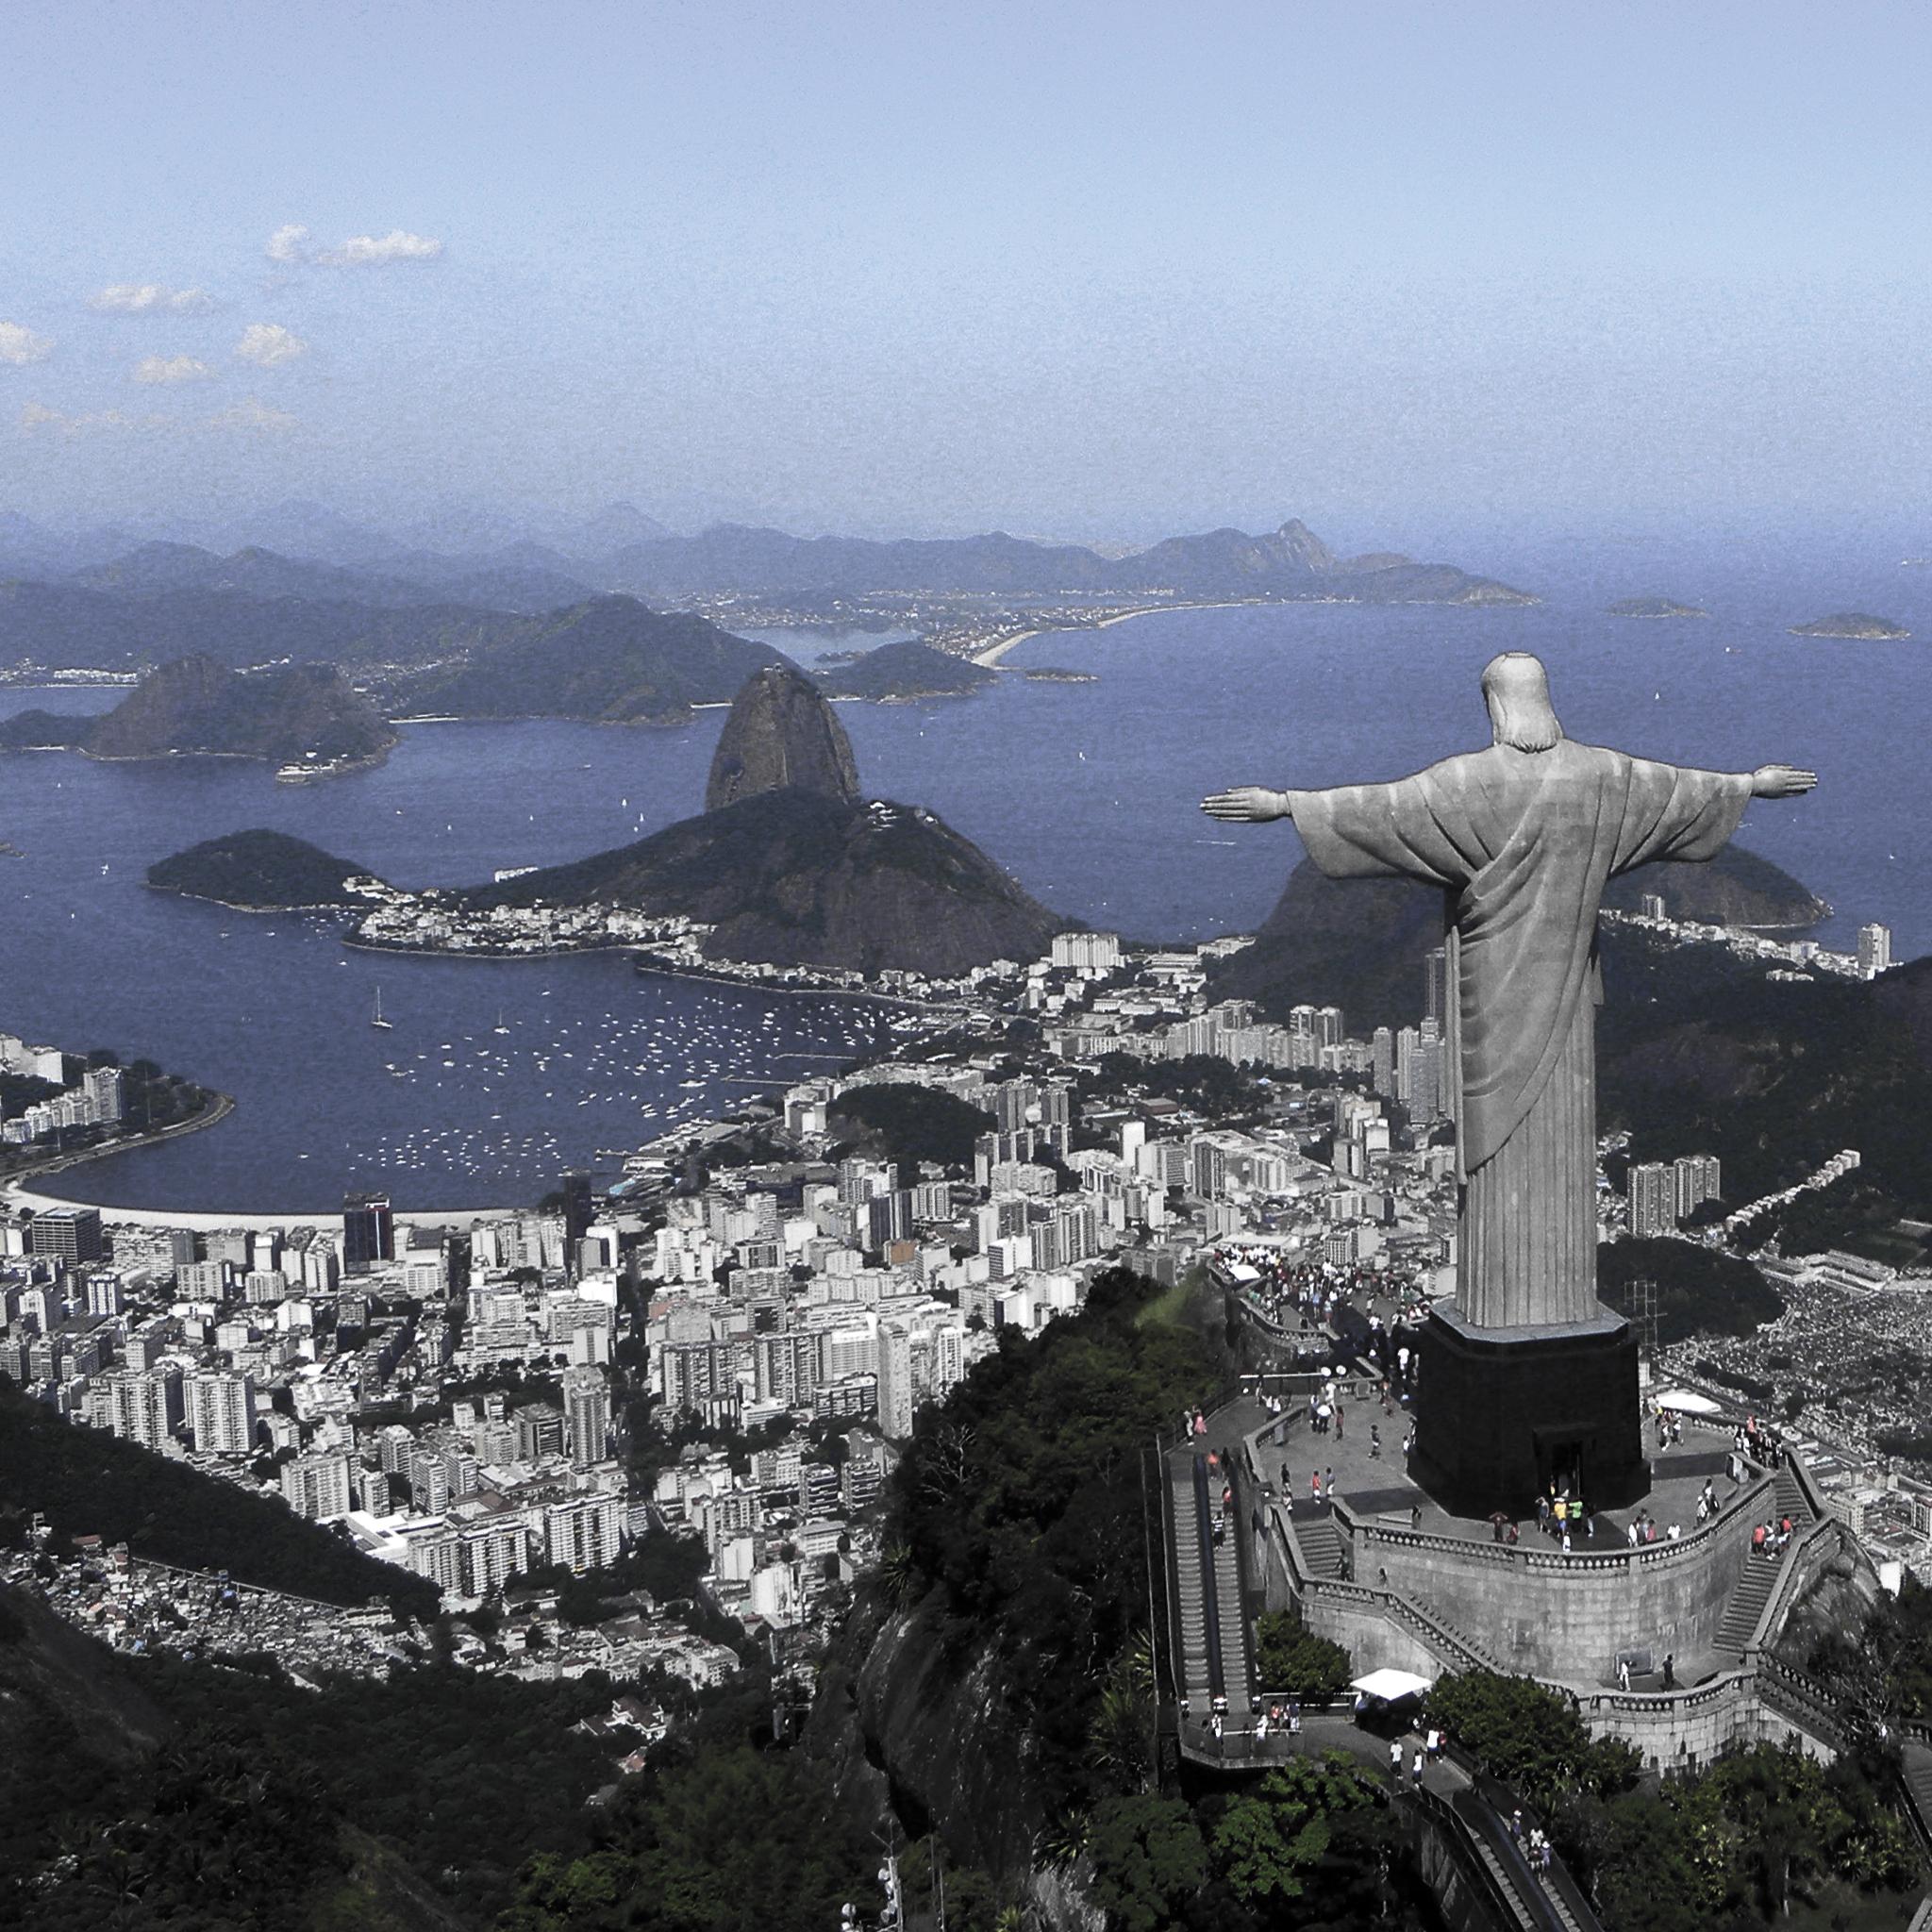 Christ on Corcovado Mountain 3Wallpapers iPad Christ on Corcovado Mountain   iPad